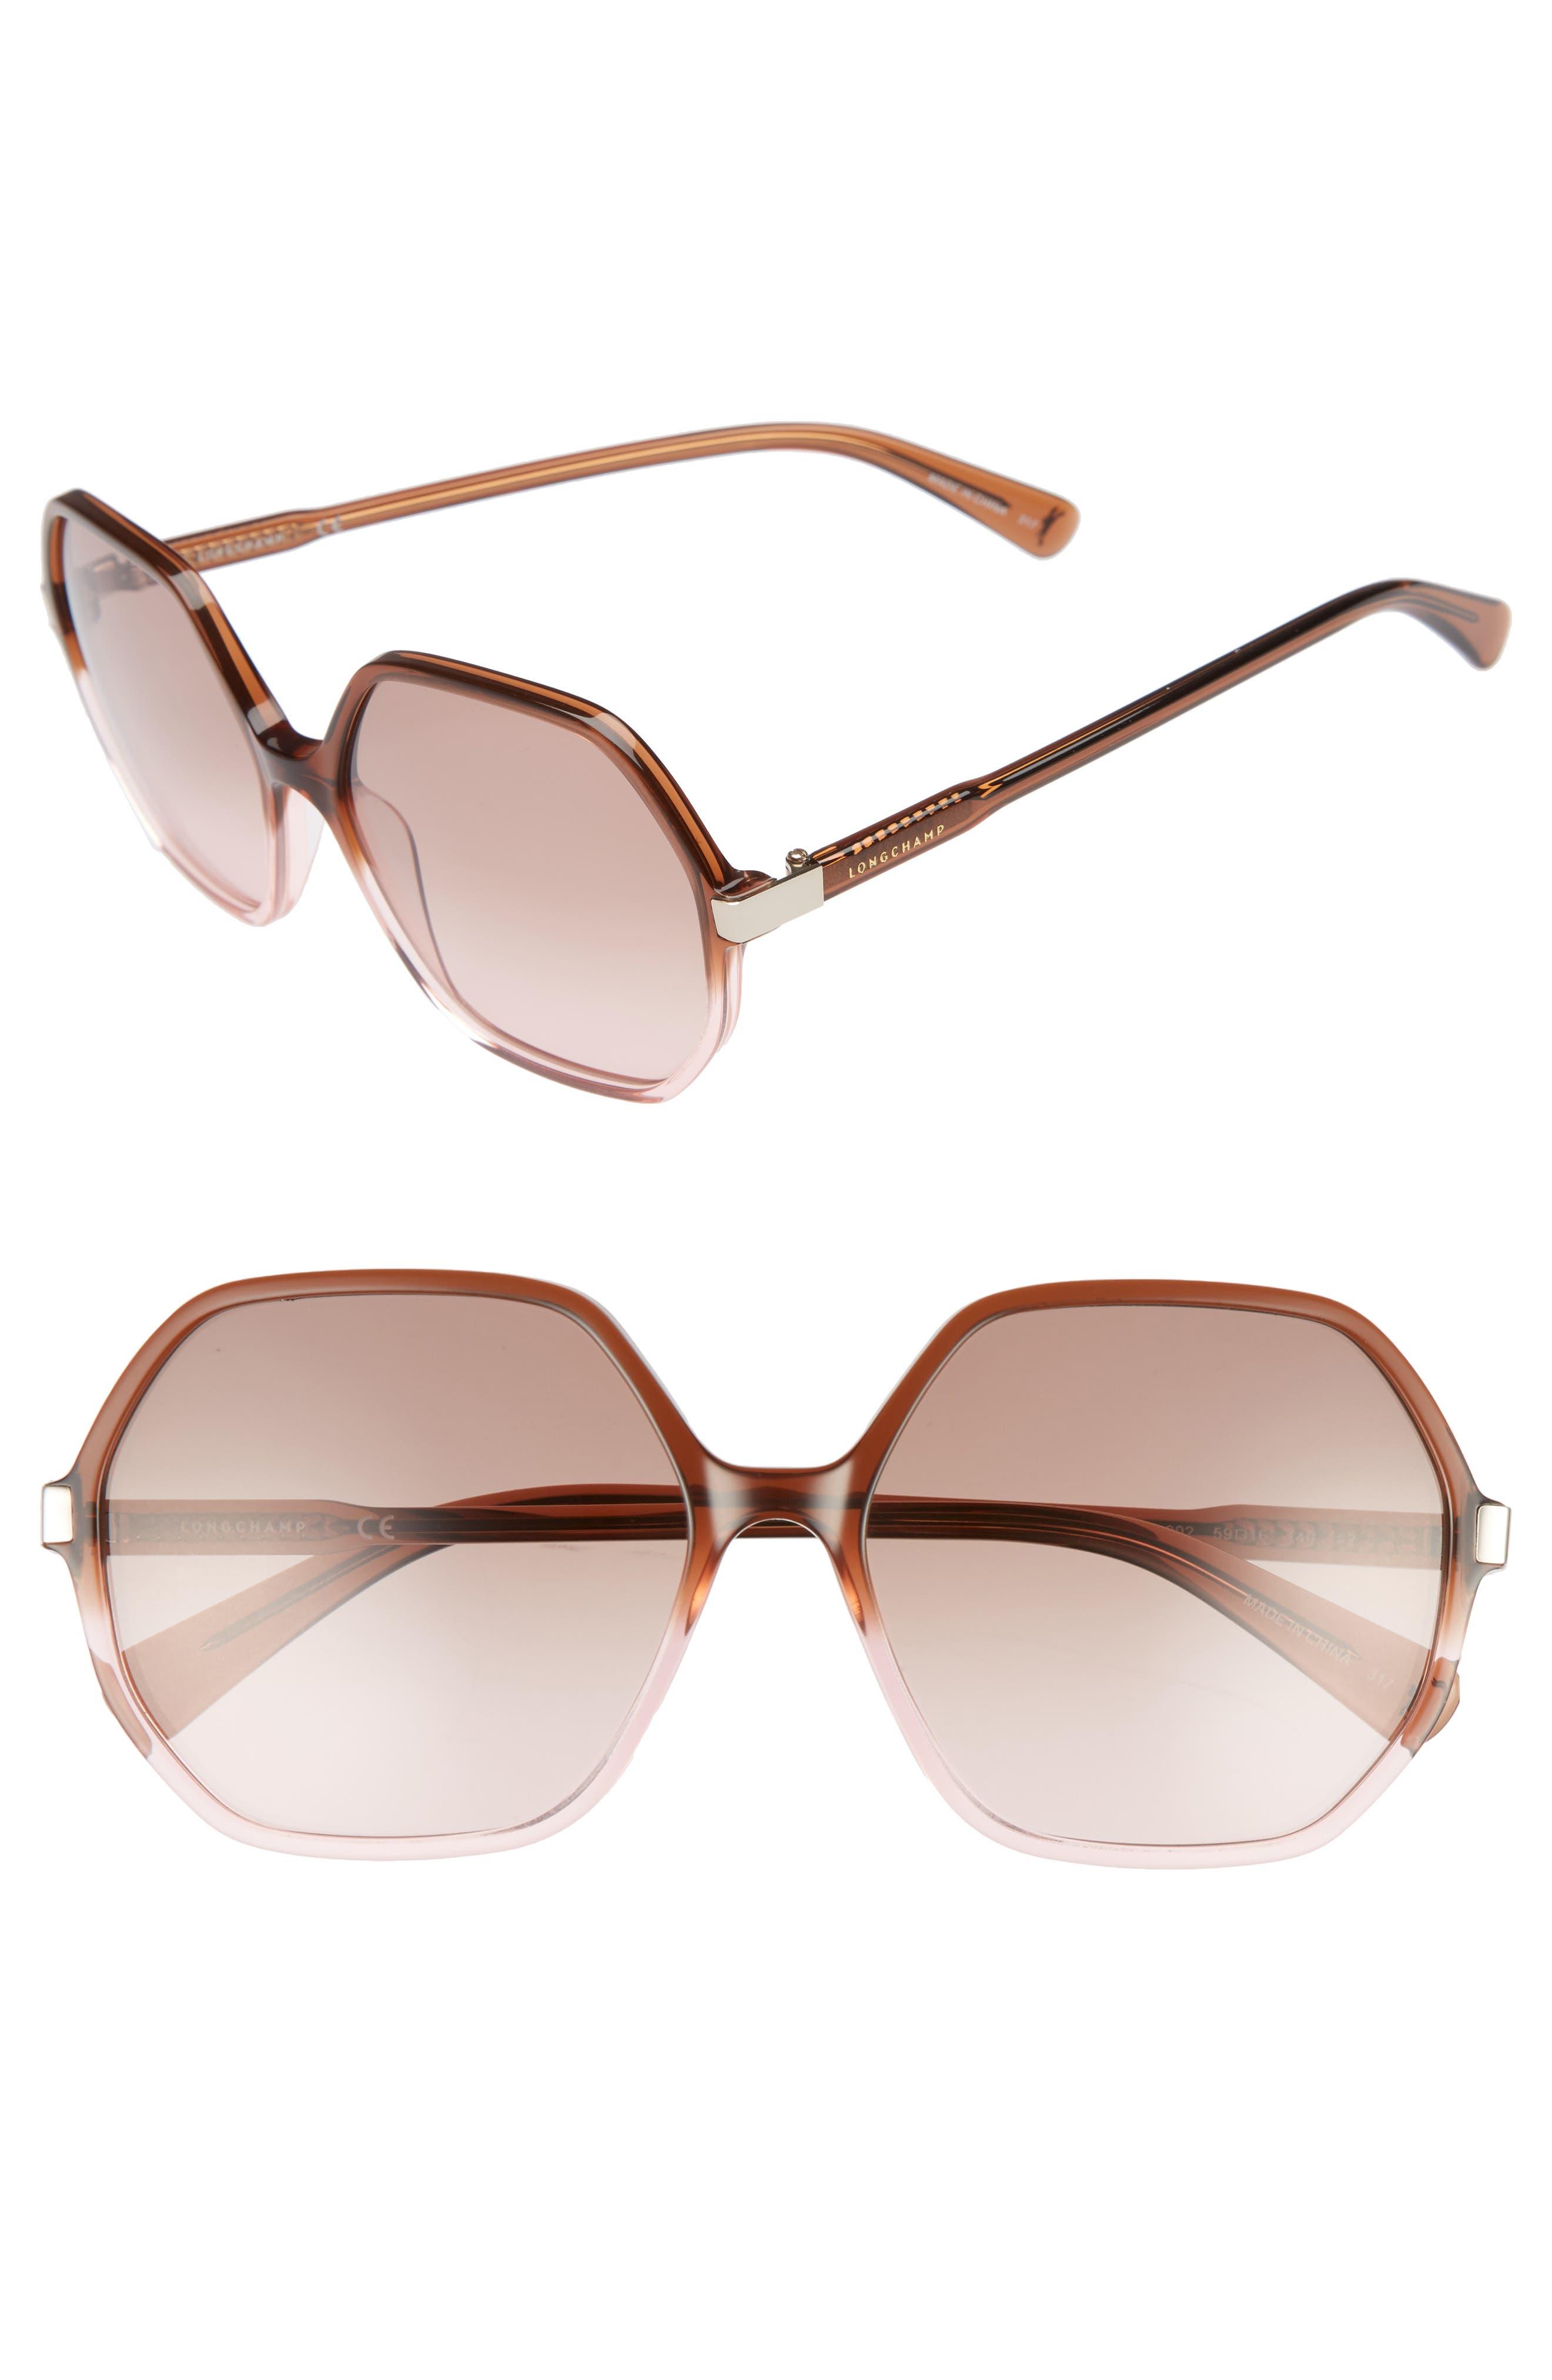 Retro Sunglasses | Vintage Glasses | New Vintage Eyeglasses Womens Longchamp 59Mm Gradient Lens Hexagonal Sunglasses - $126.00 AT vintagedancer.com